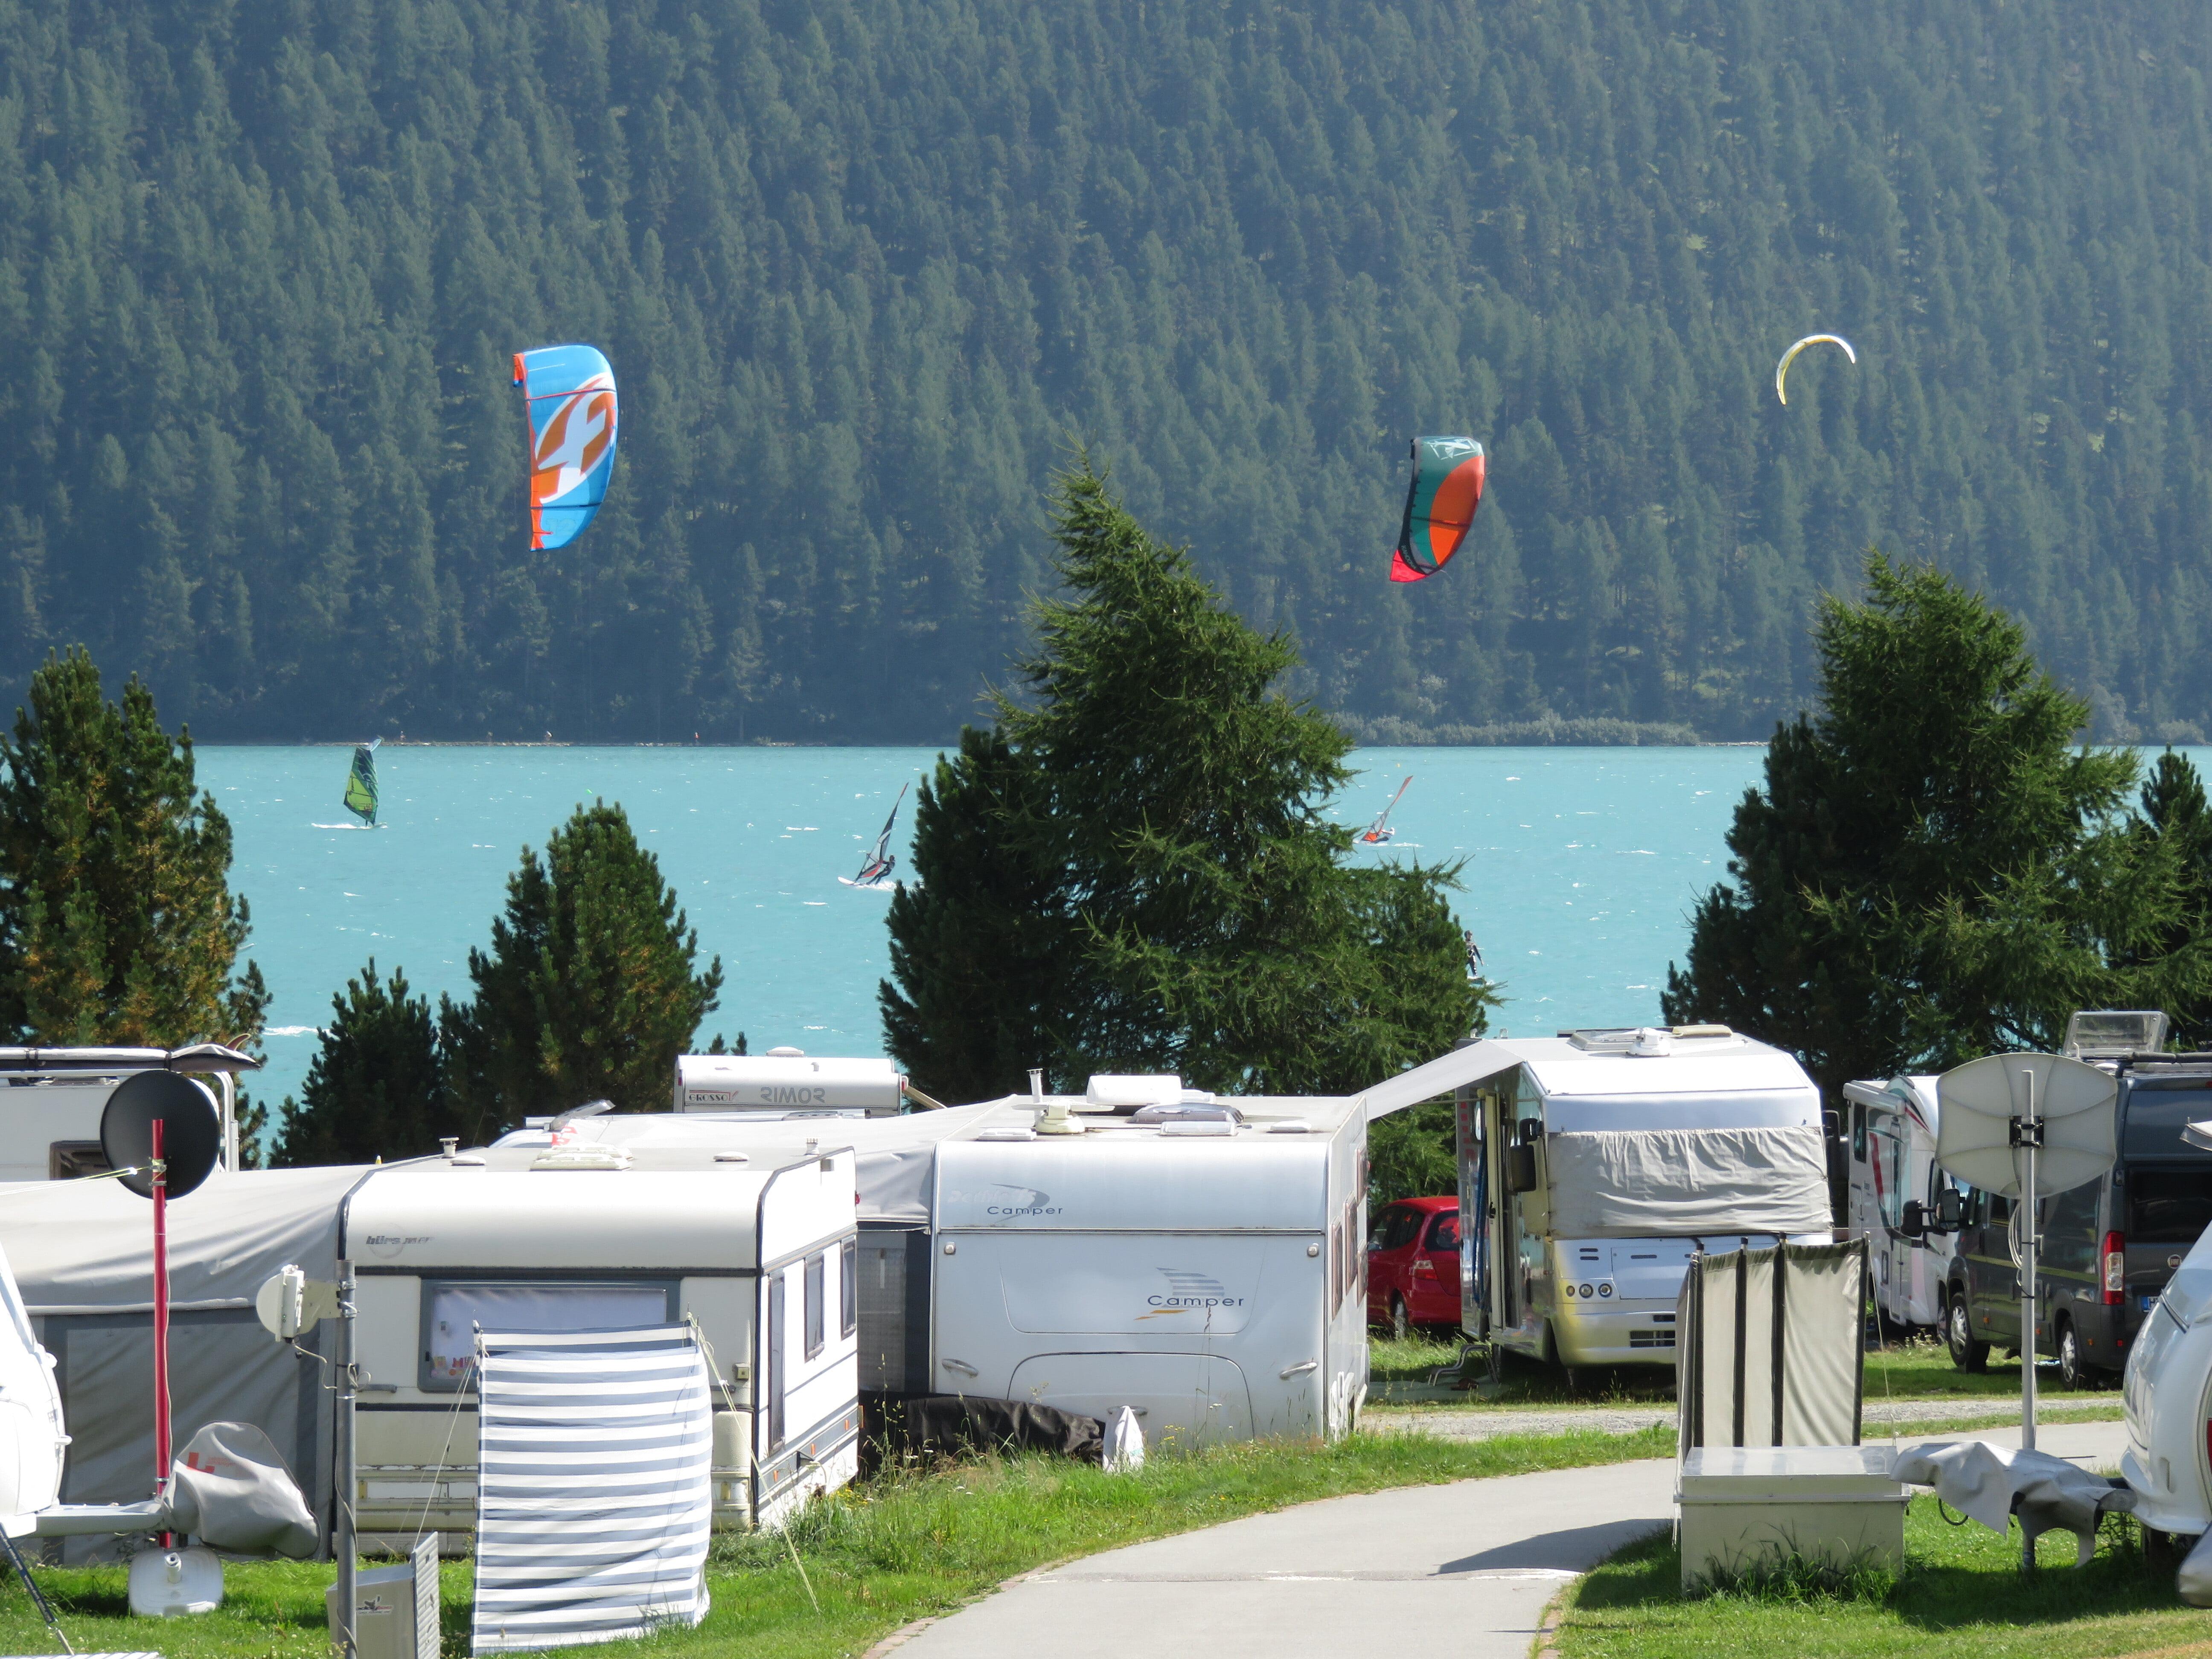 Camping in Silvaplana